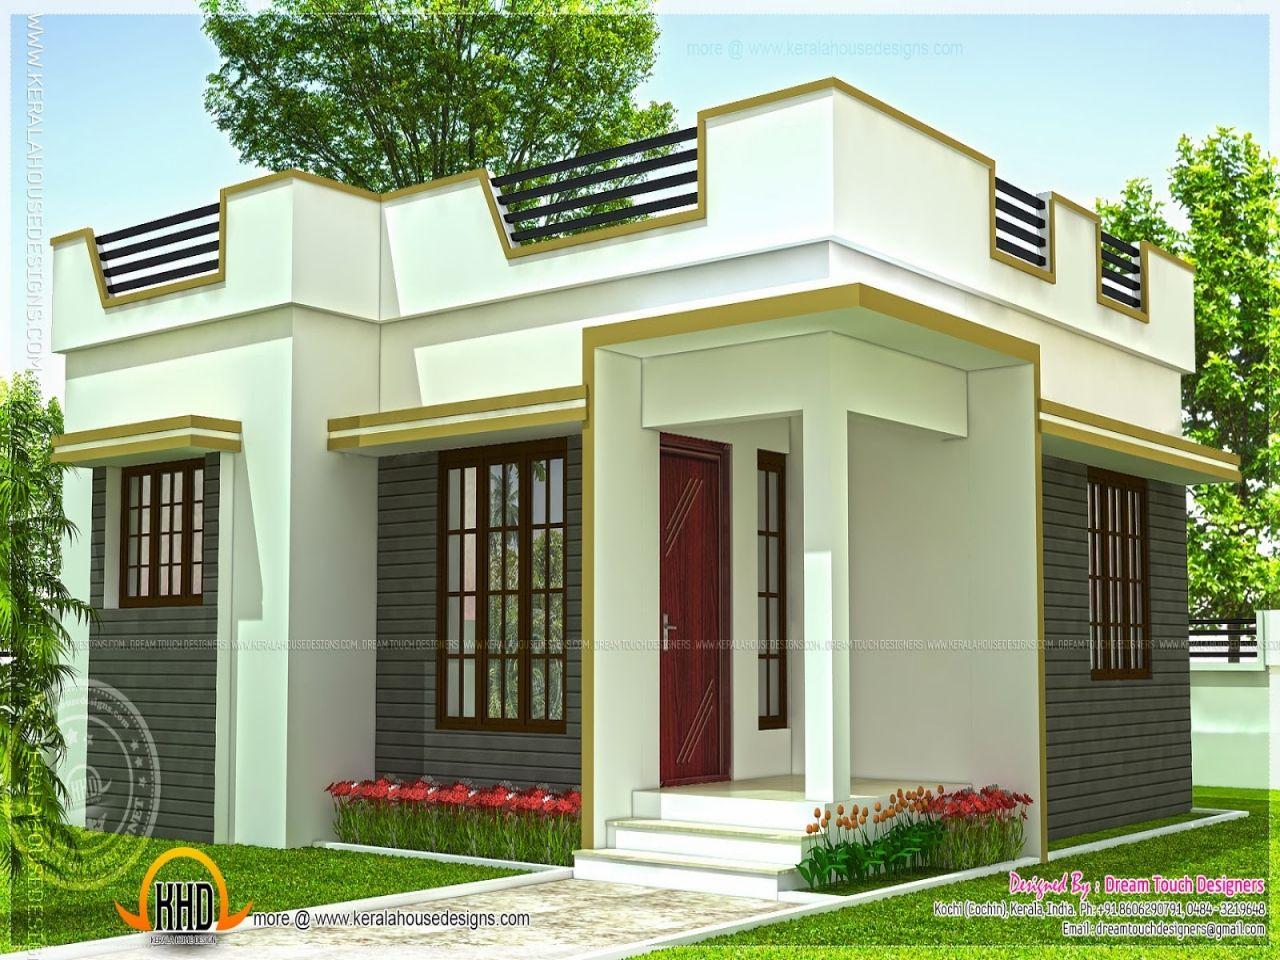 beach house plans small kerala style indian stilts floor pilings